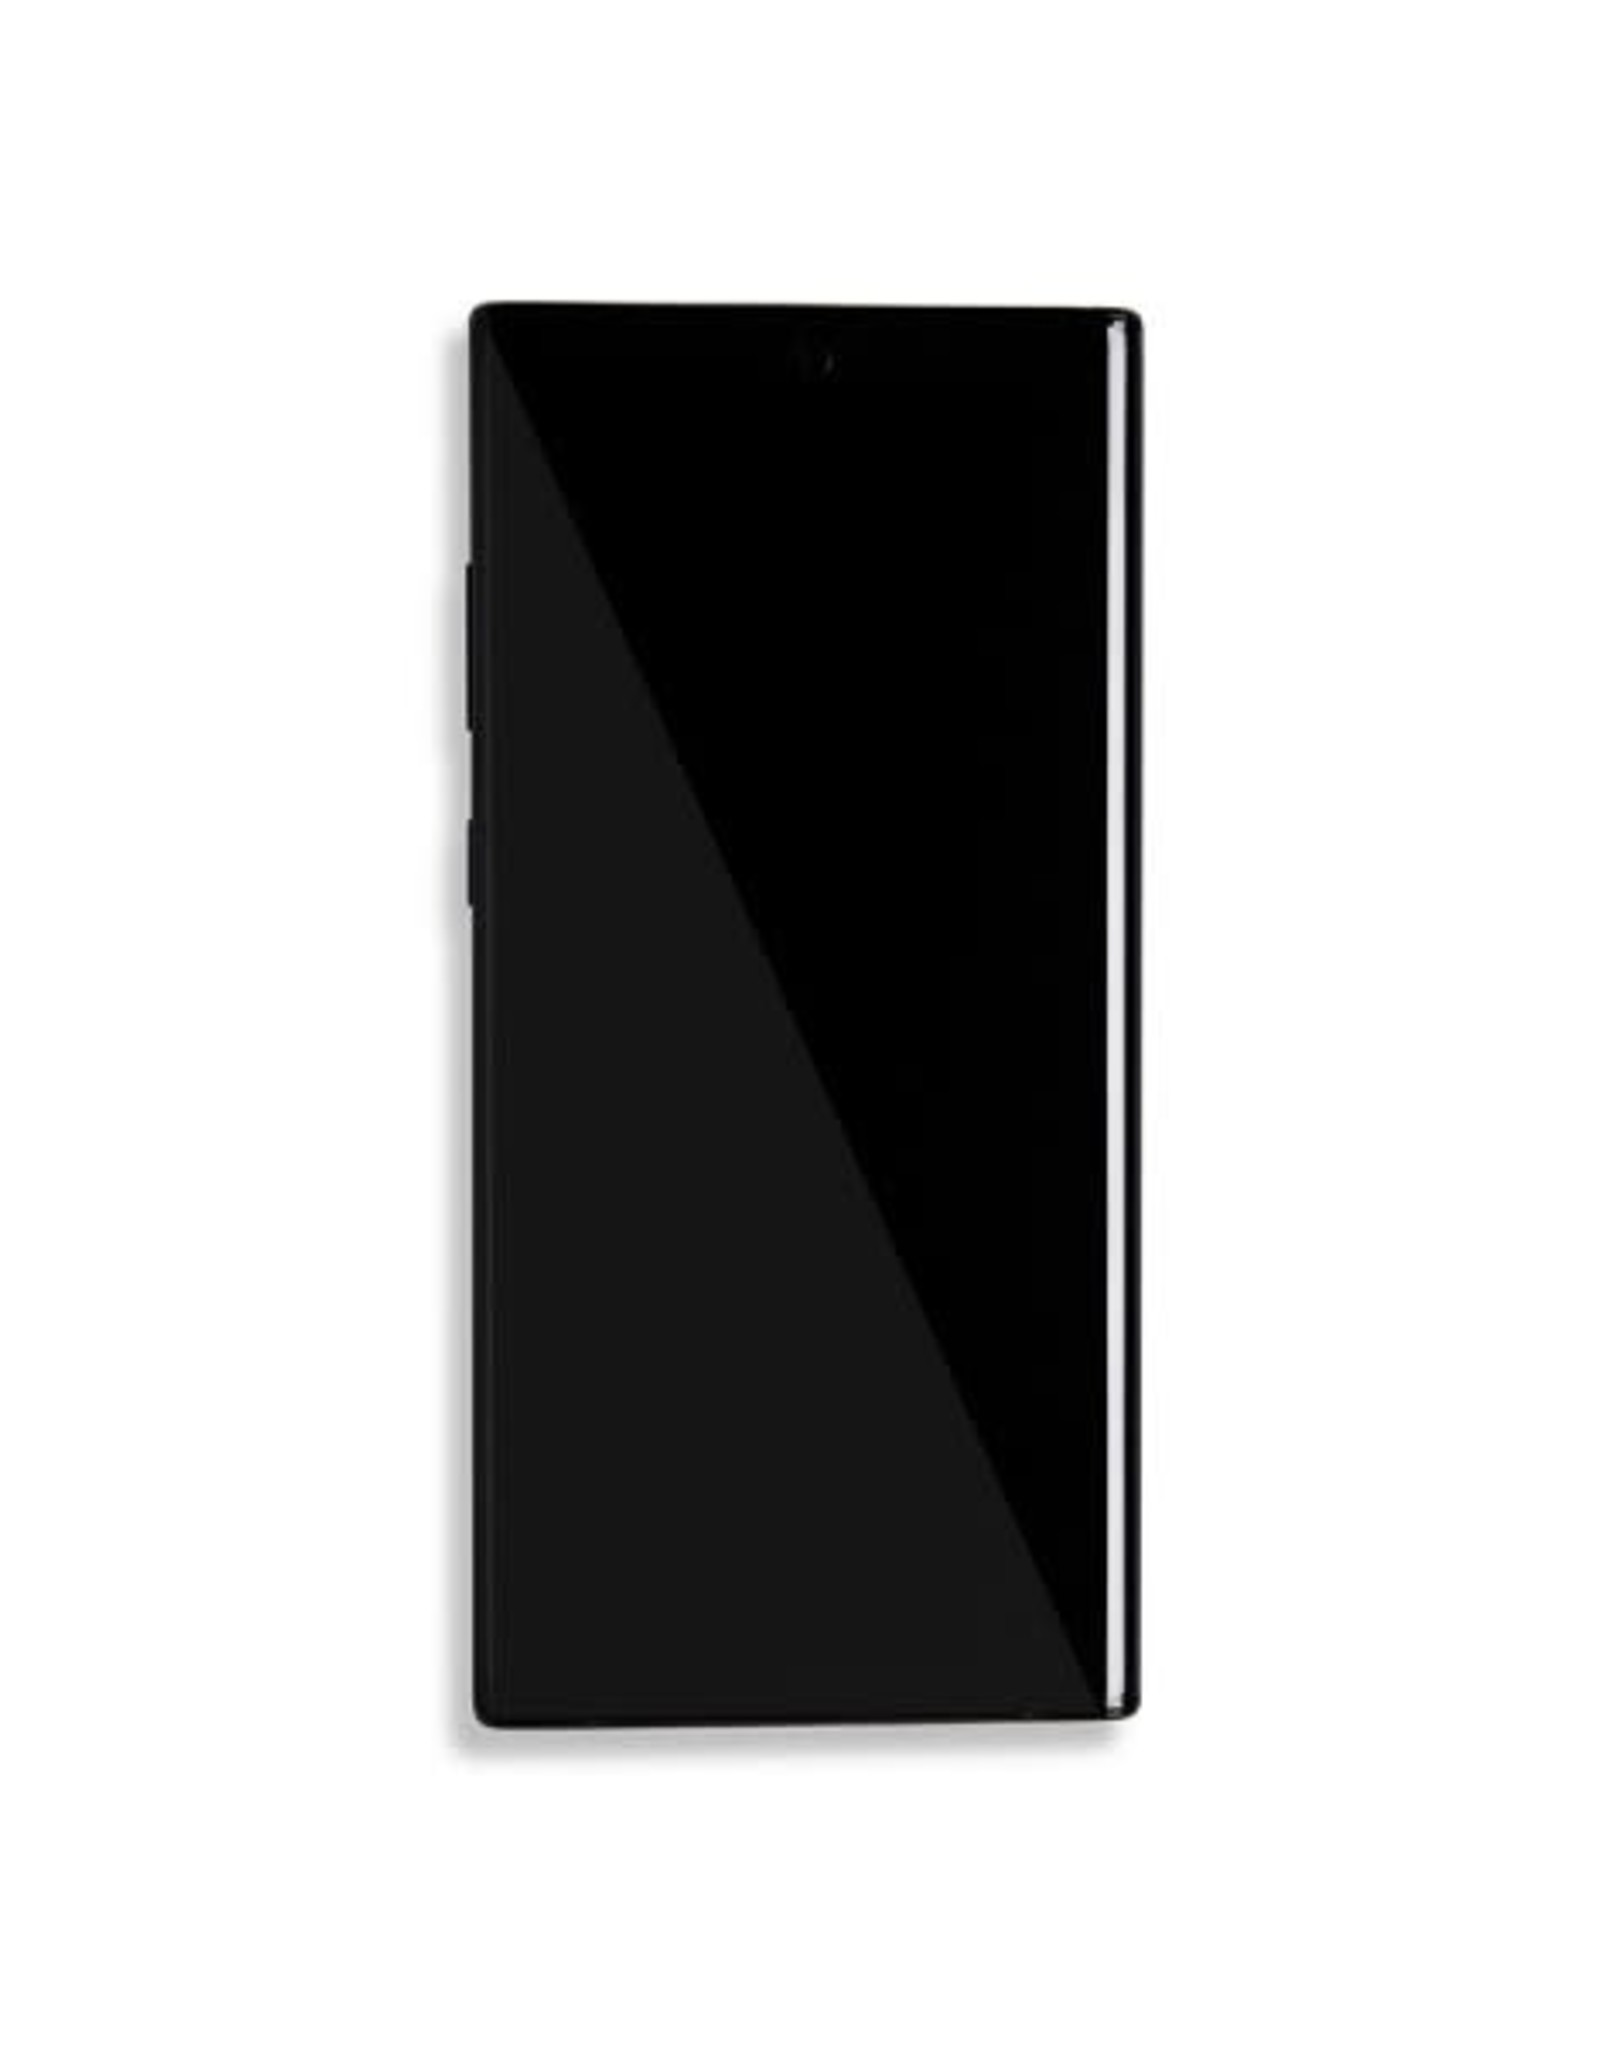 Samsung Galaxy Note 10 Plus Note10+ N975 N975F LCD Display Touch Screen Digitizer - Black